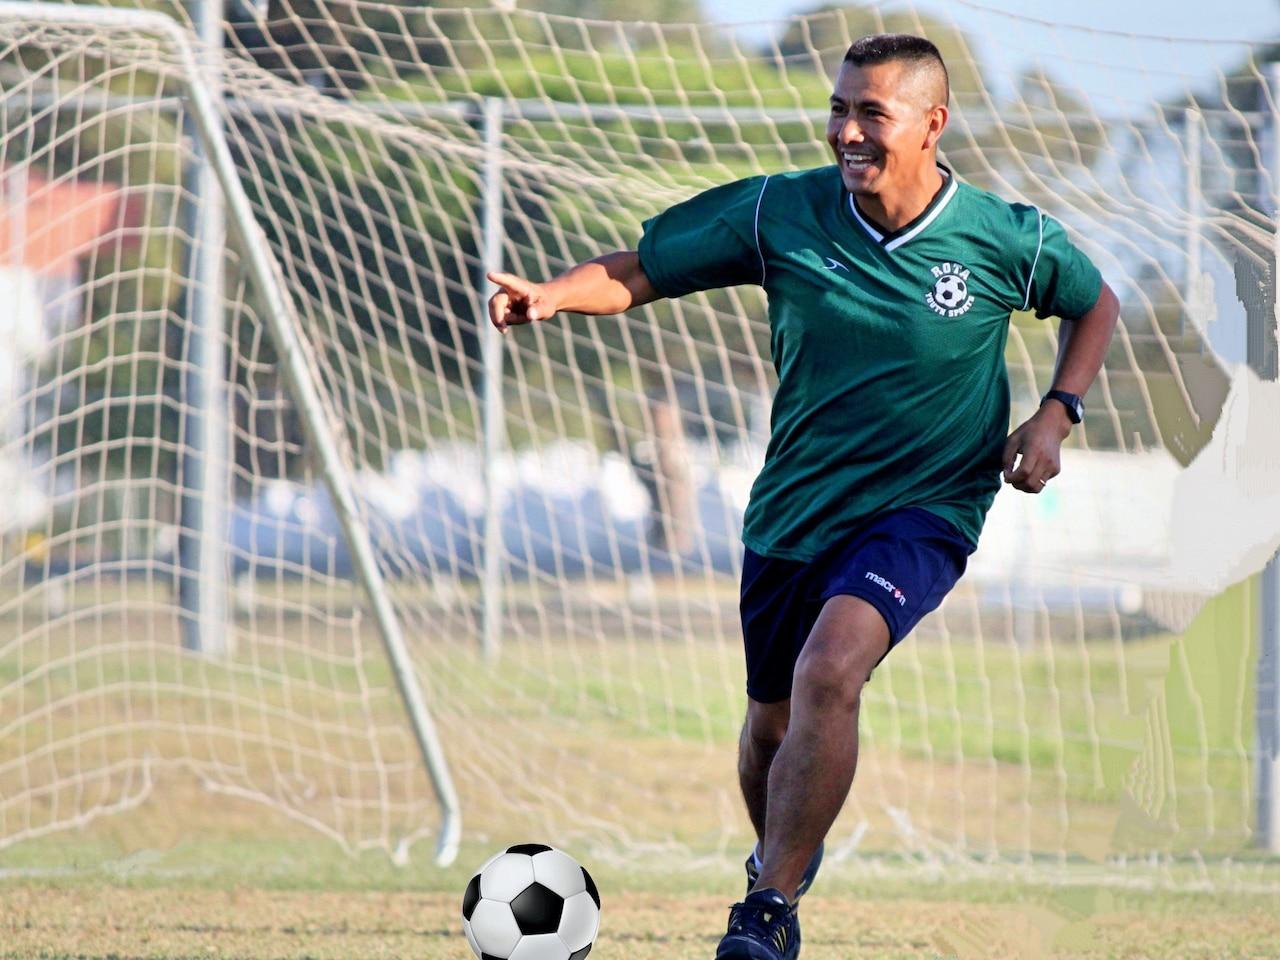 A man dressed in a soccer uniform runs toward a soccer ball on a field.